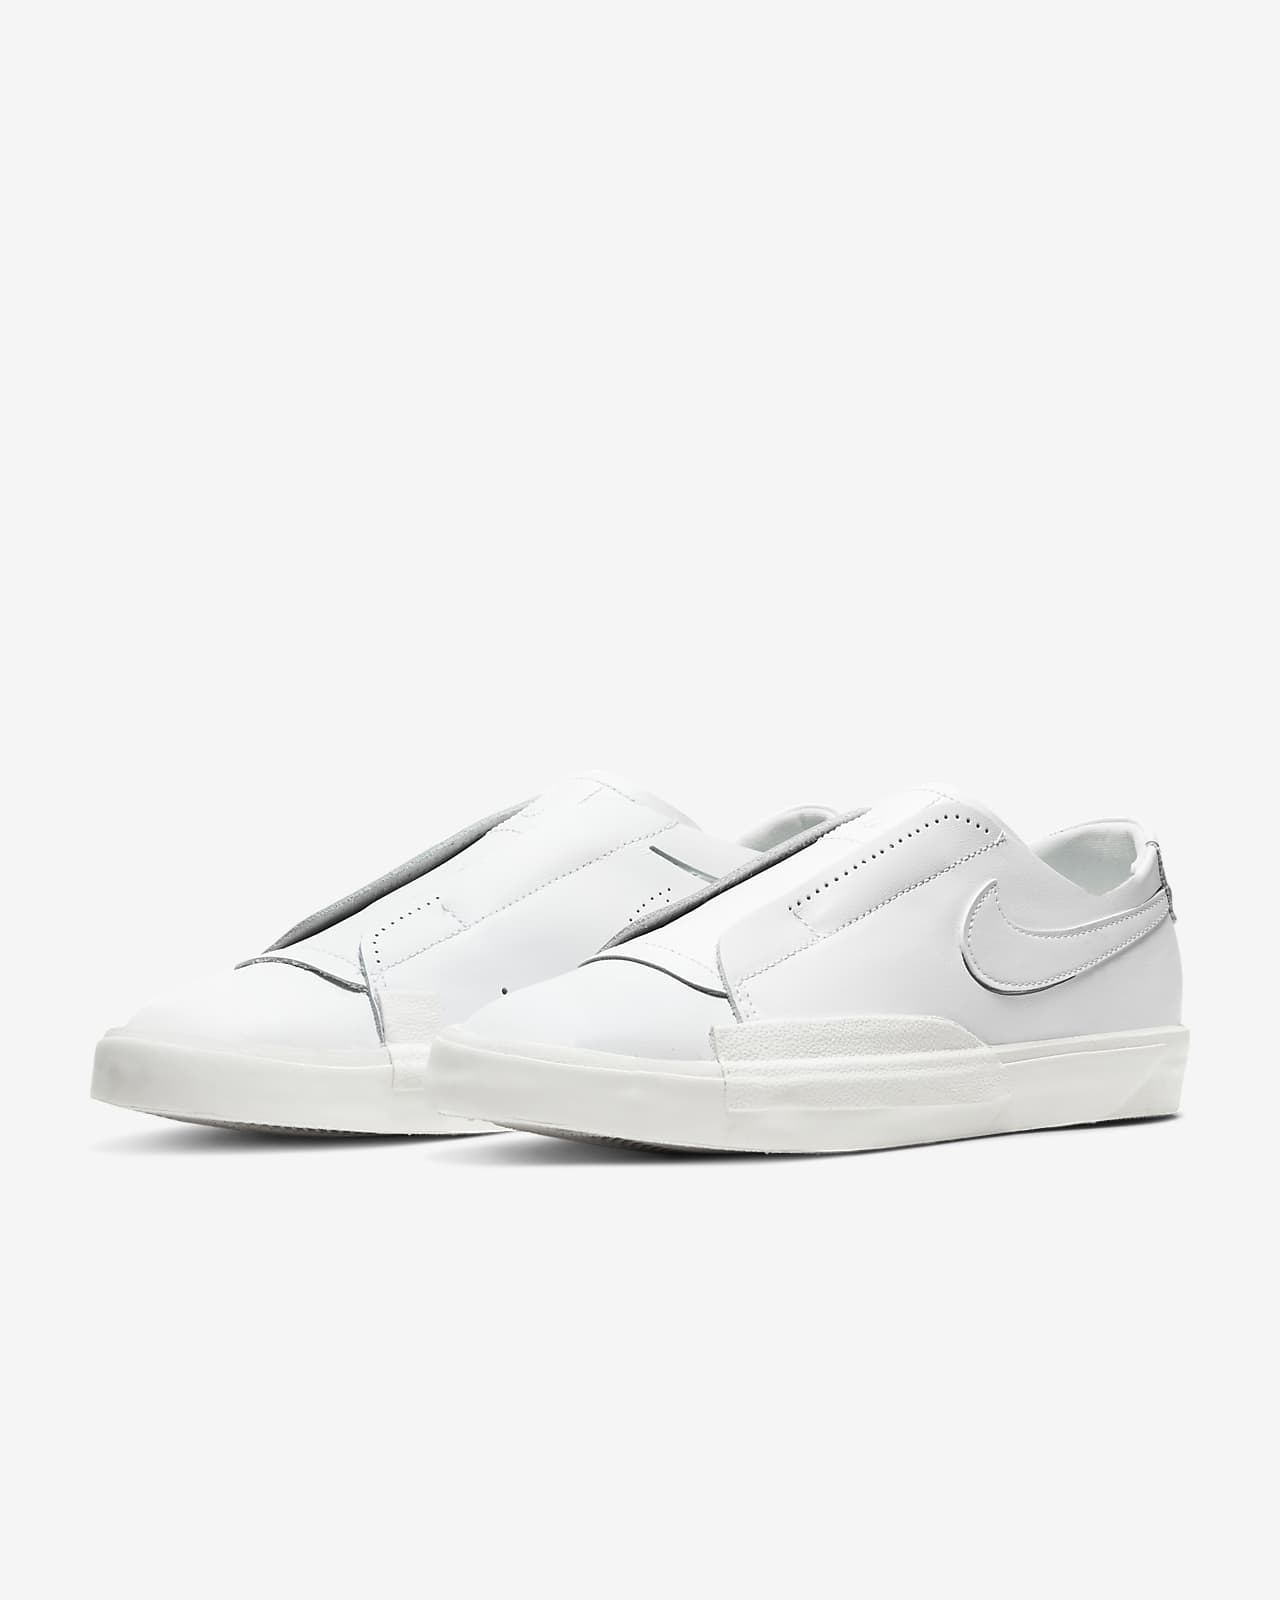 Nike Blazer Low Kickdown Women's Shoe